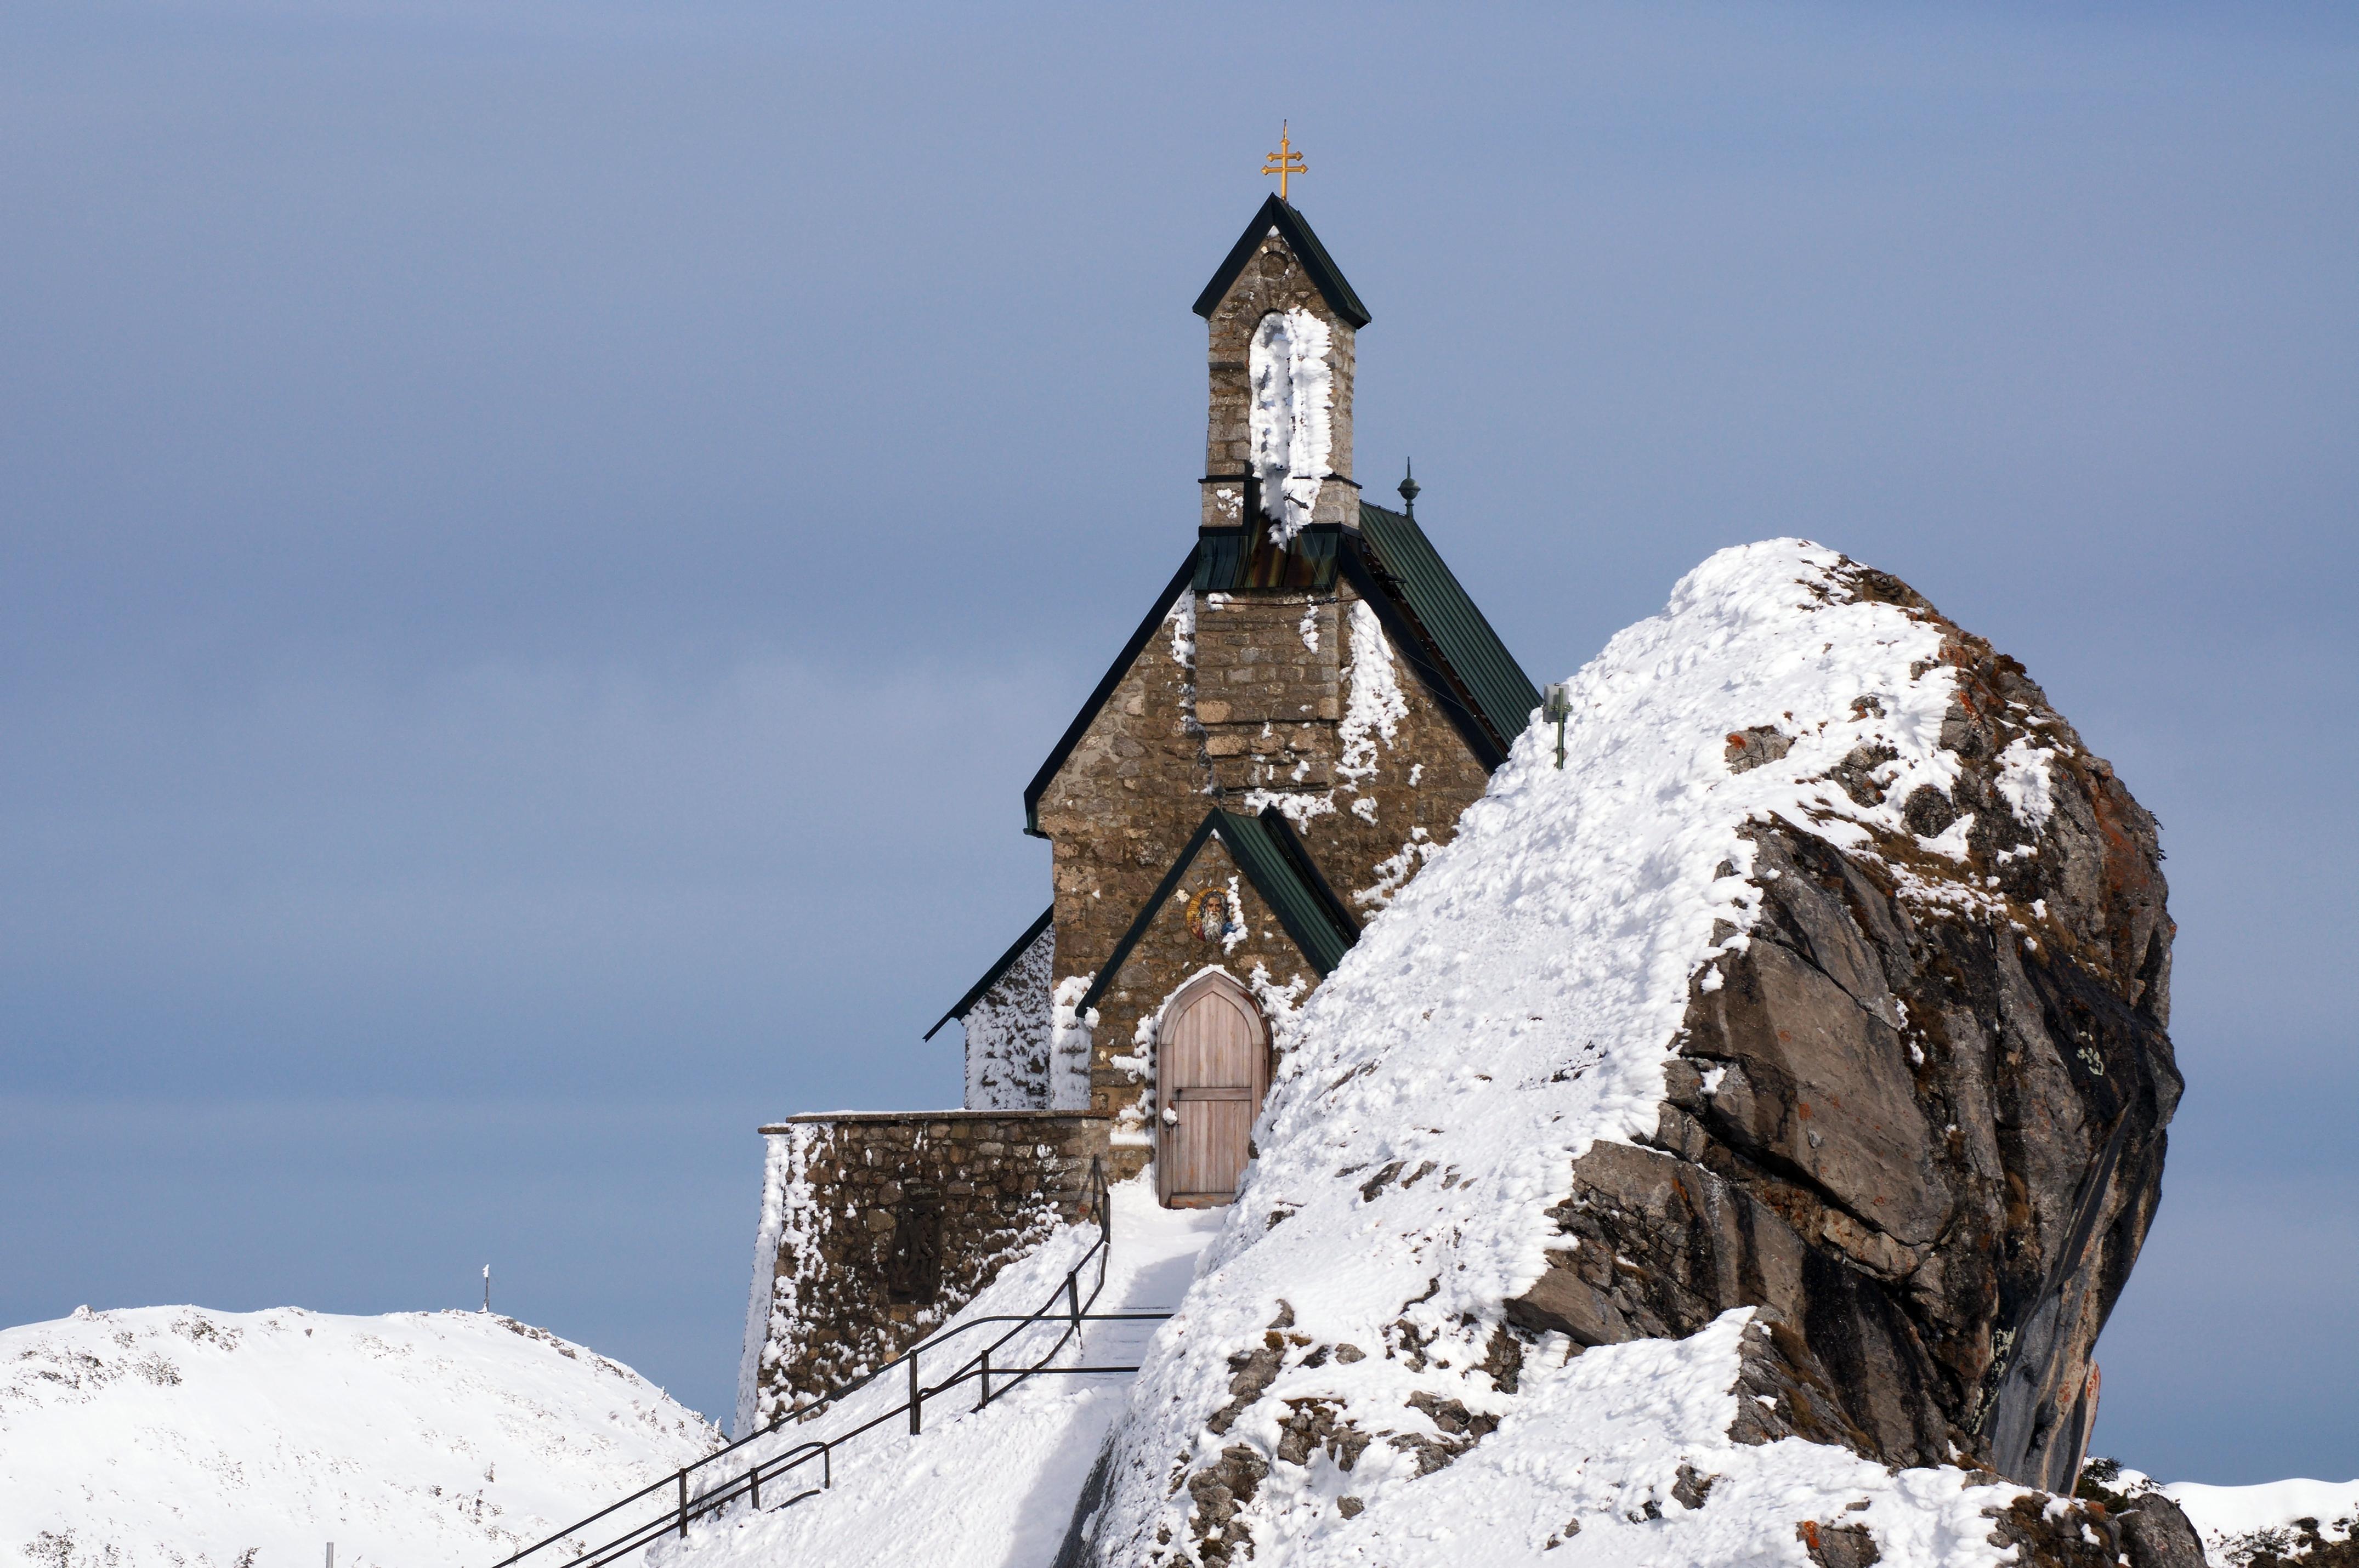 Simon Koopmann. Часовня на вершине Вендельштайна (Бавария, Германия).